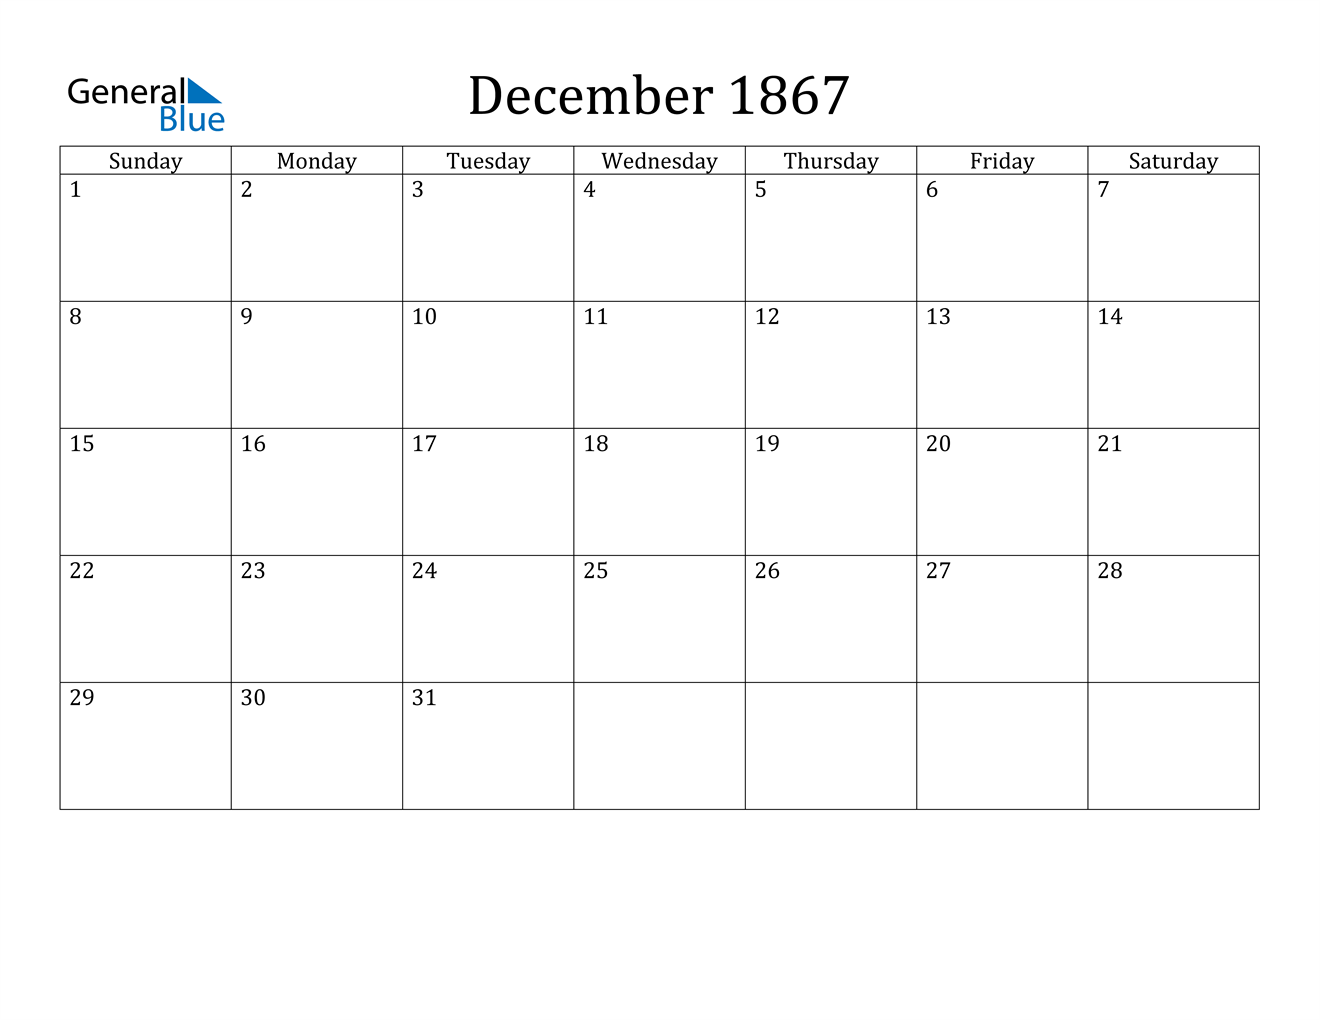 Image of December 1867 Calendar